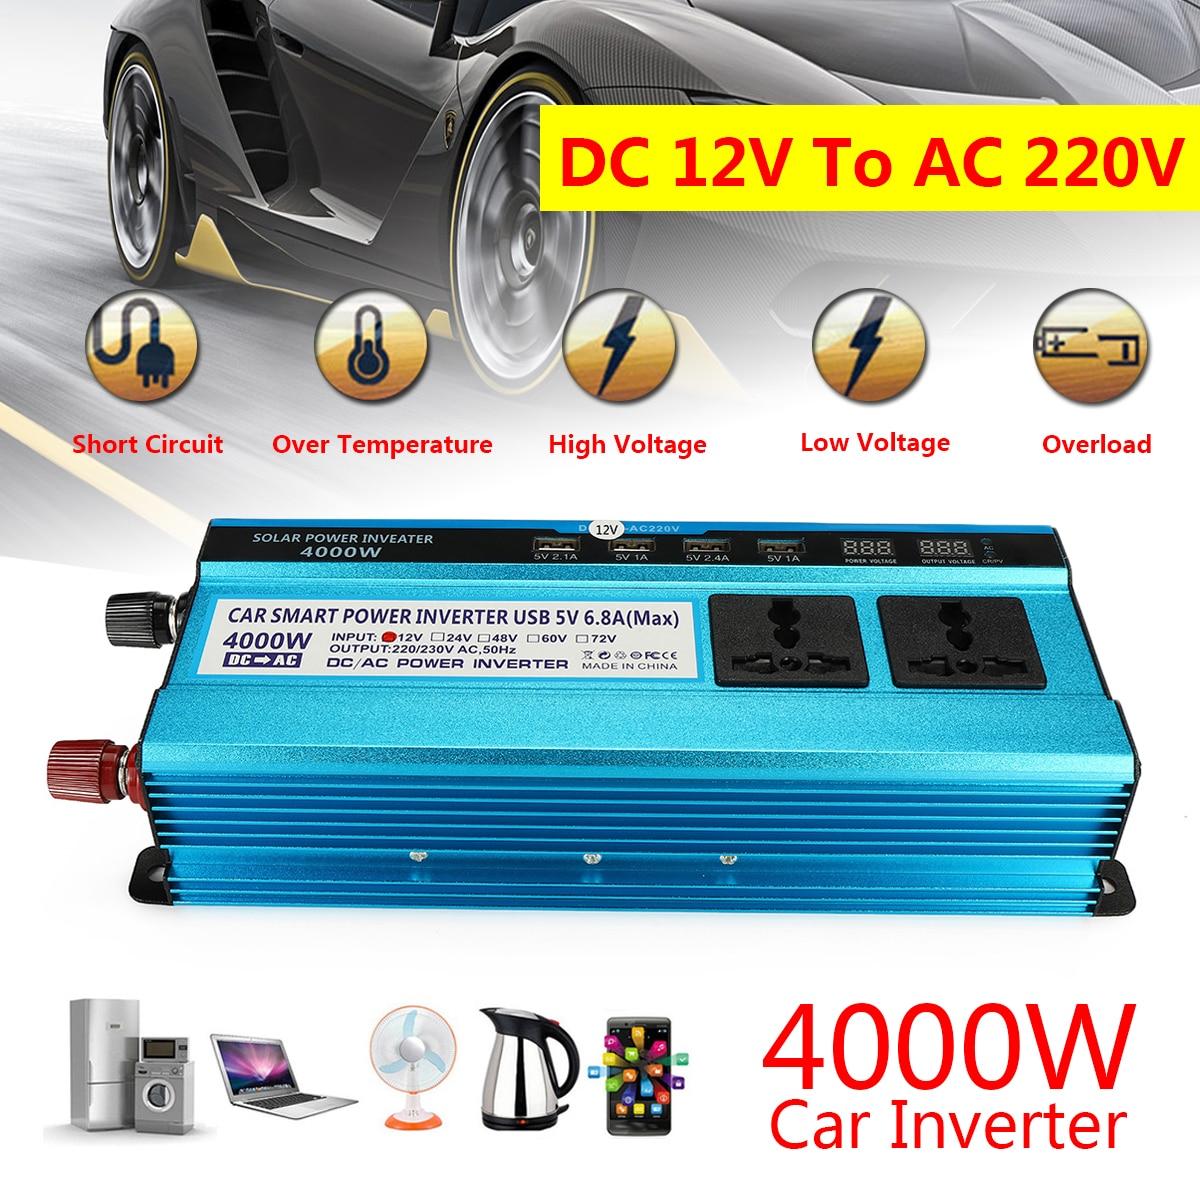 Voltage Transformer DC 12/24V to AC 220V Car LED Solar Power Inverter Sine Wave Peak 4000W USB Converter Short Circuit Protect komatsu excavator pc200 7 pump solenoid valve 702 21 57400 free shipping